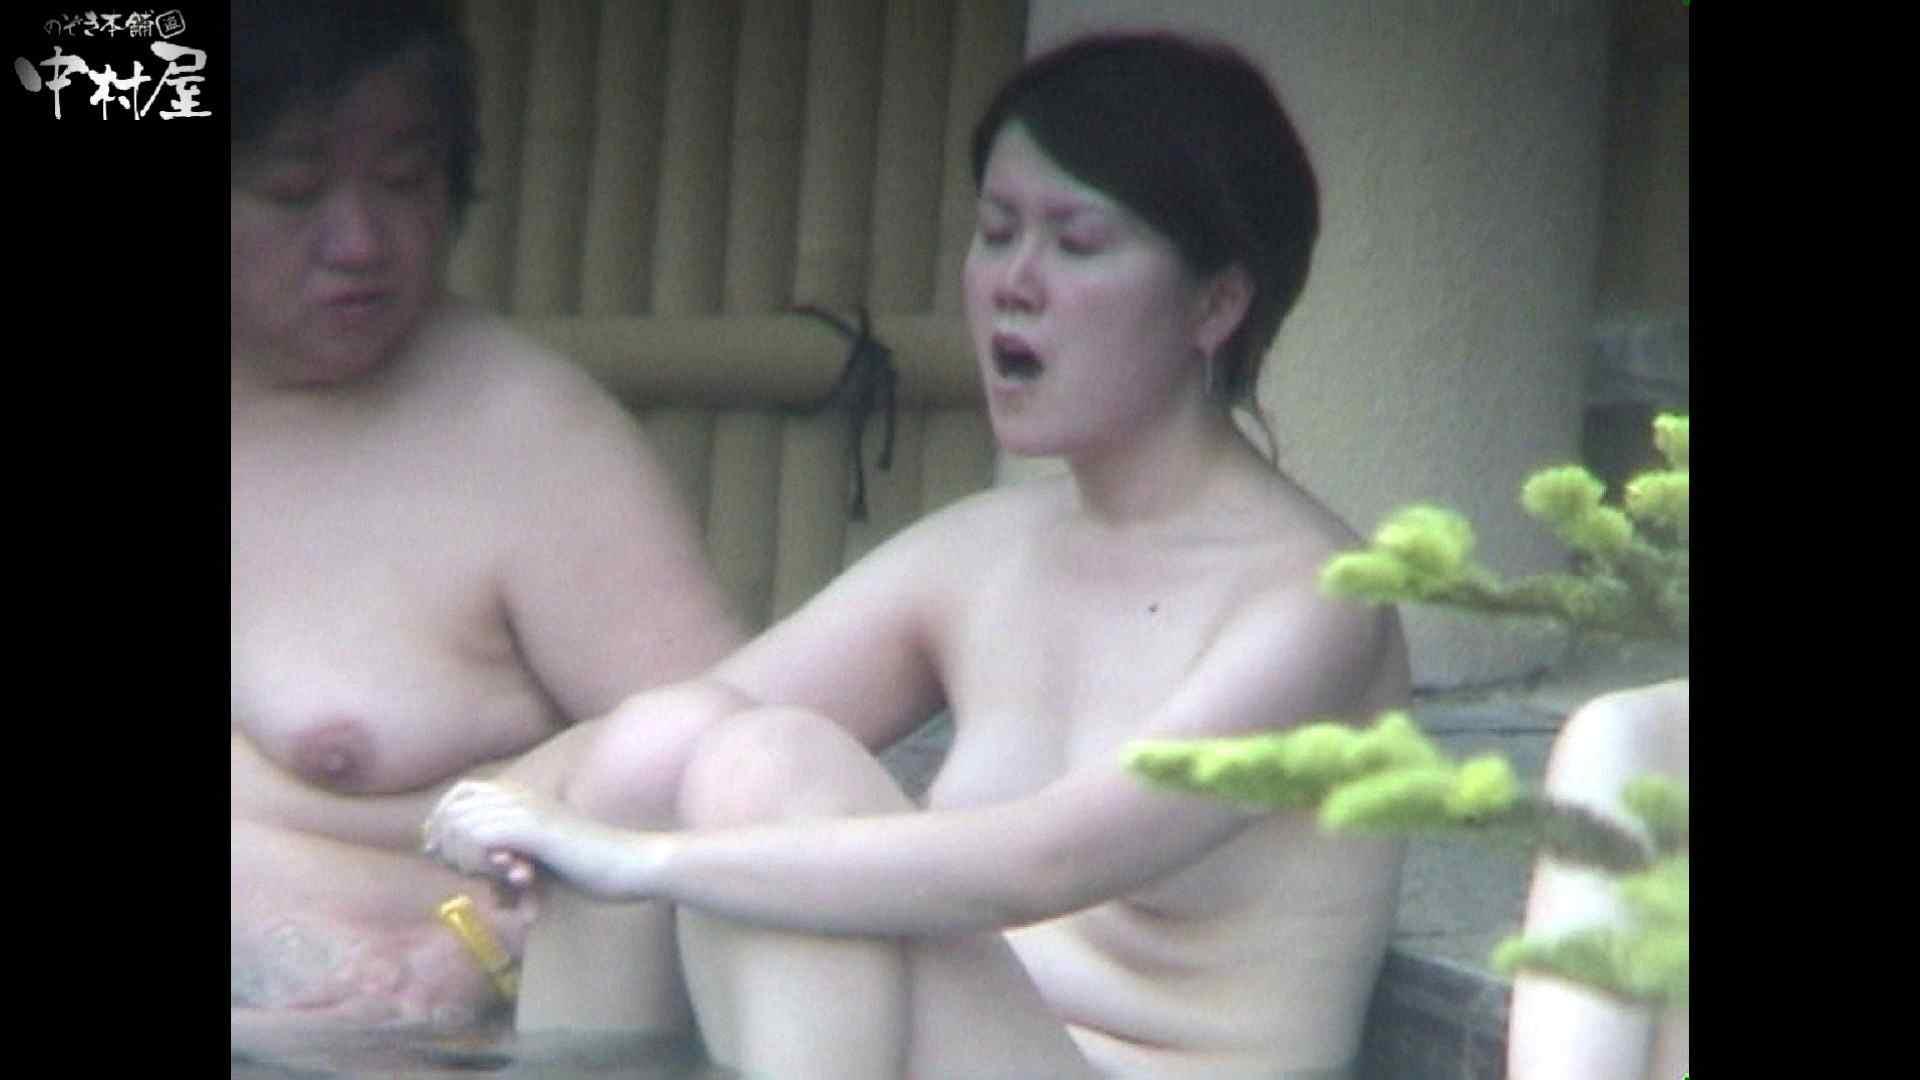 Aquaな露天風呂Vol.935 露天風呂突入 | 美しいOLの裸体  94pic 85